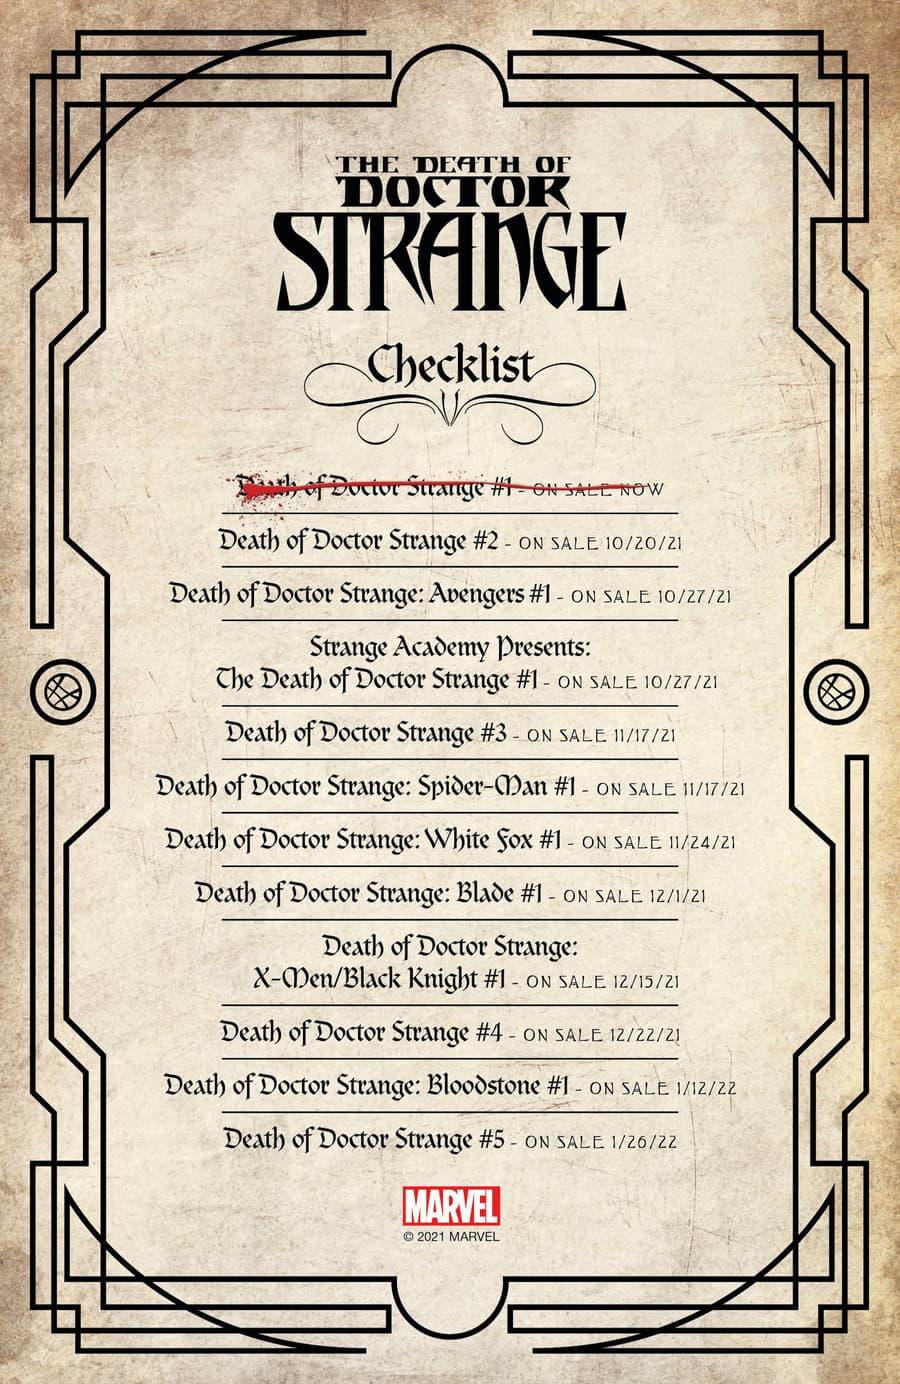 DEATH OF DOCTOR STRANGE checklist